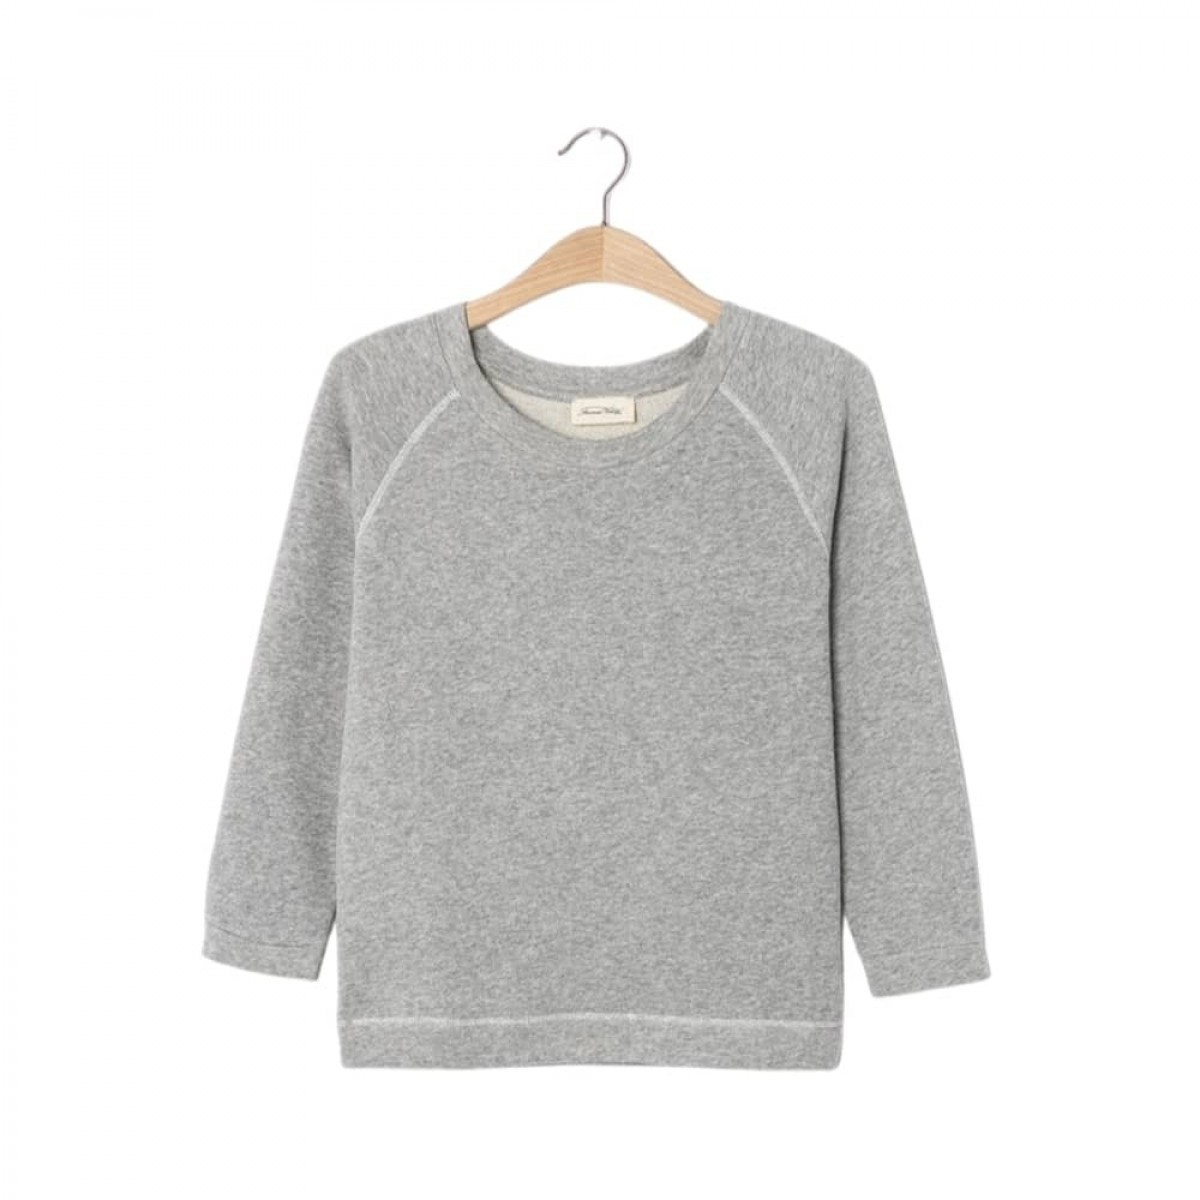 neaford sweat - heather grey - front